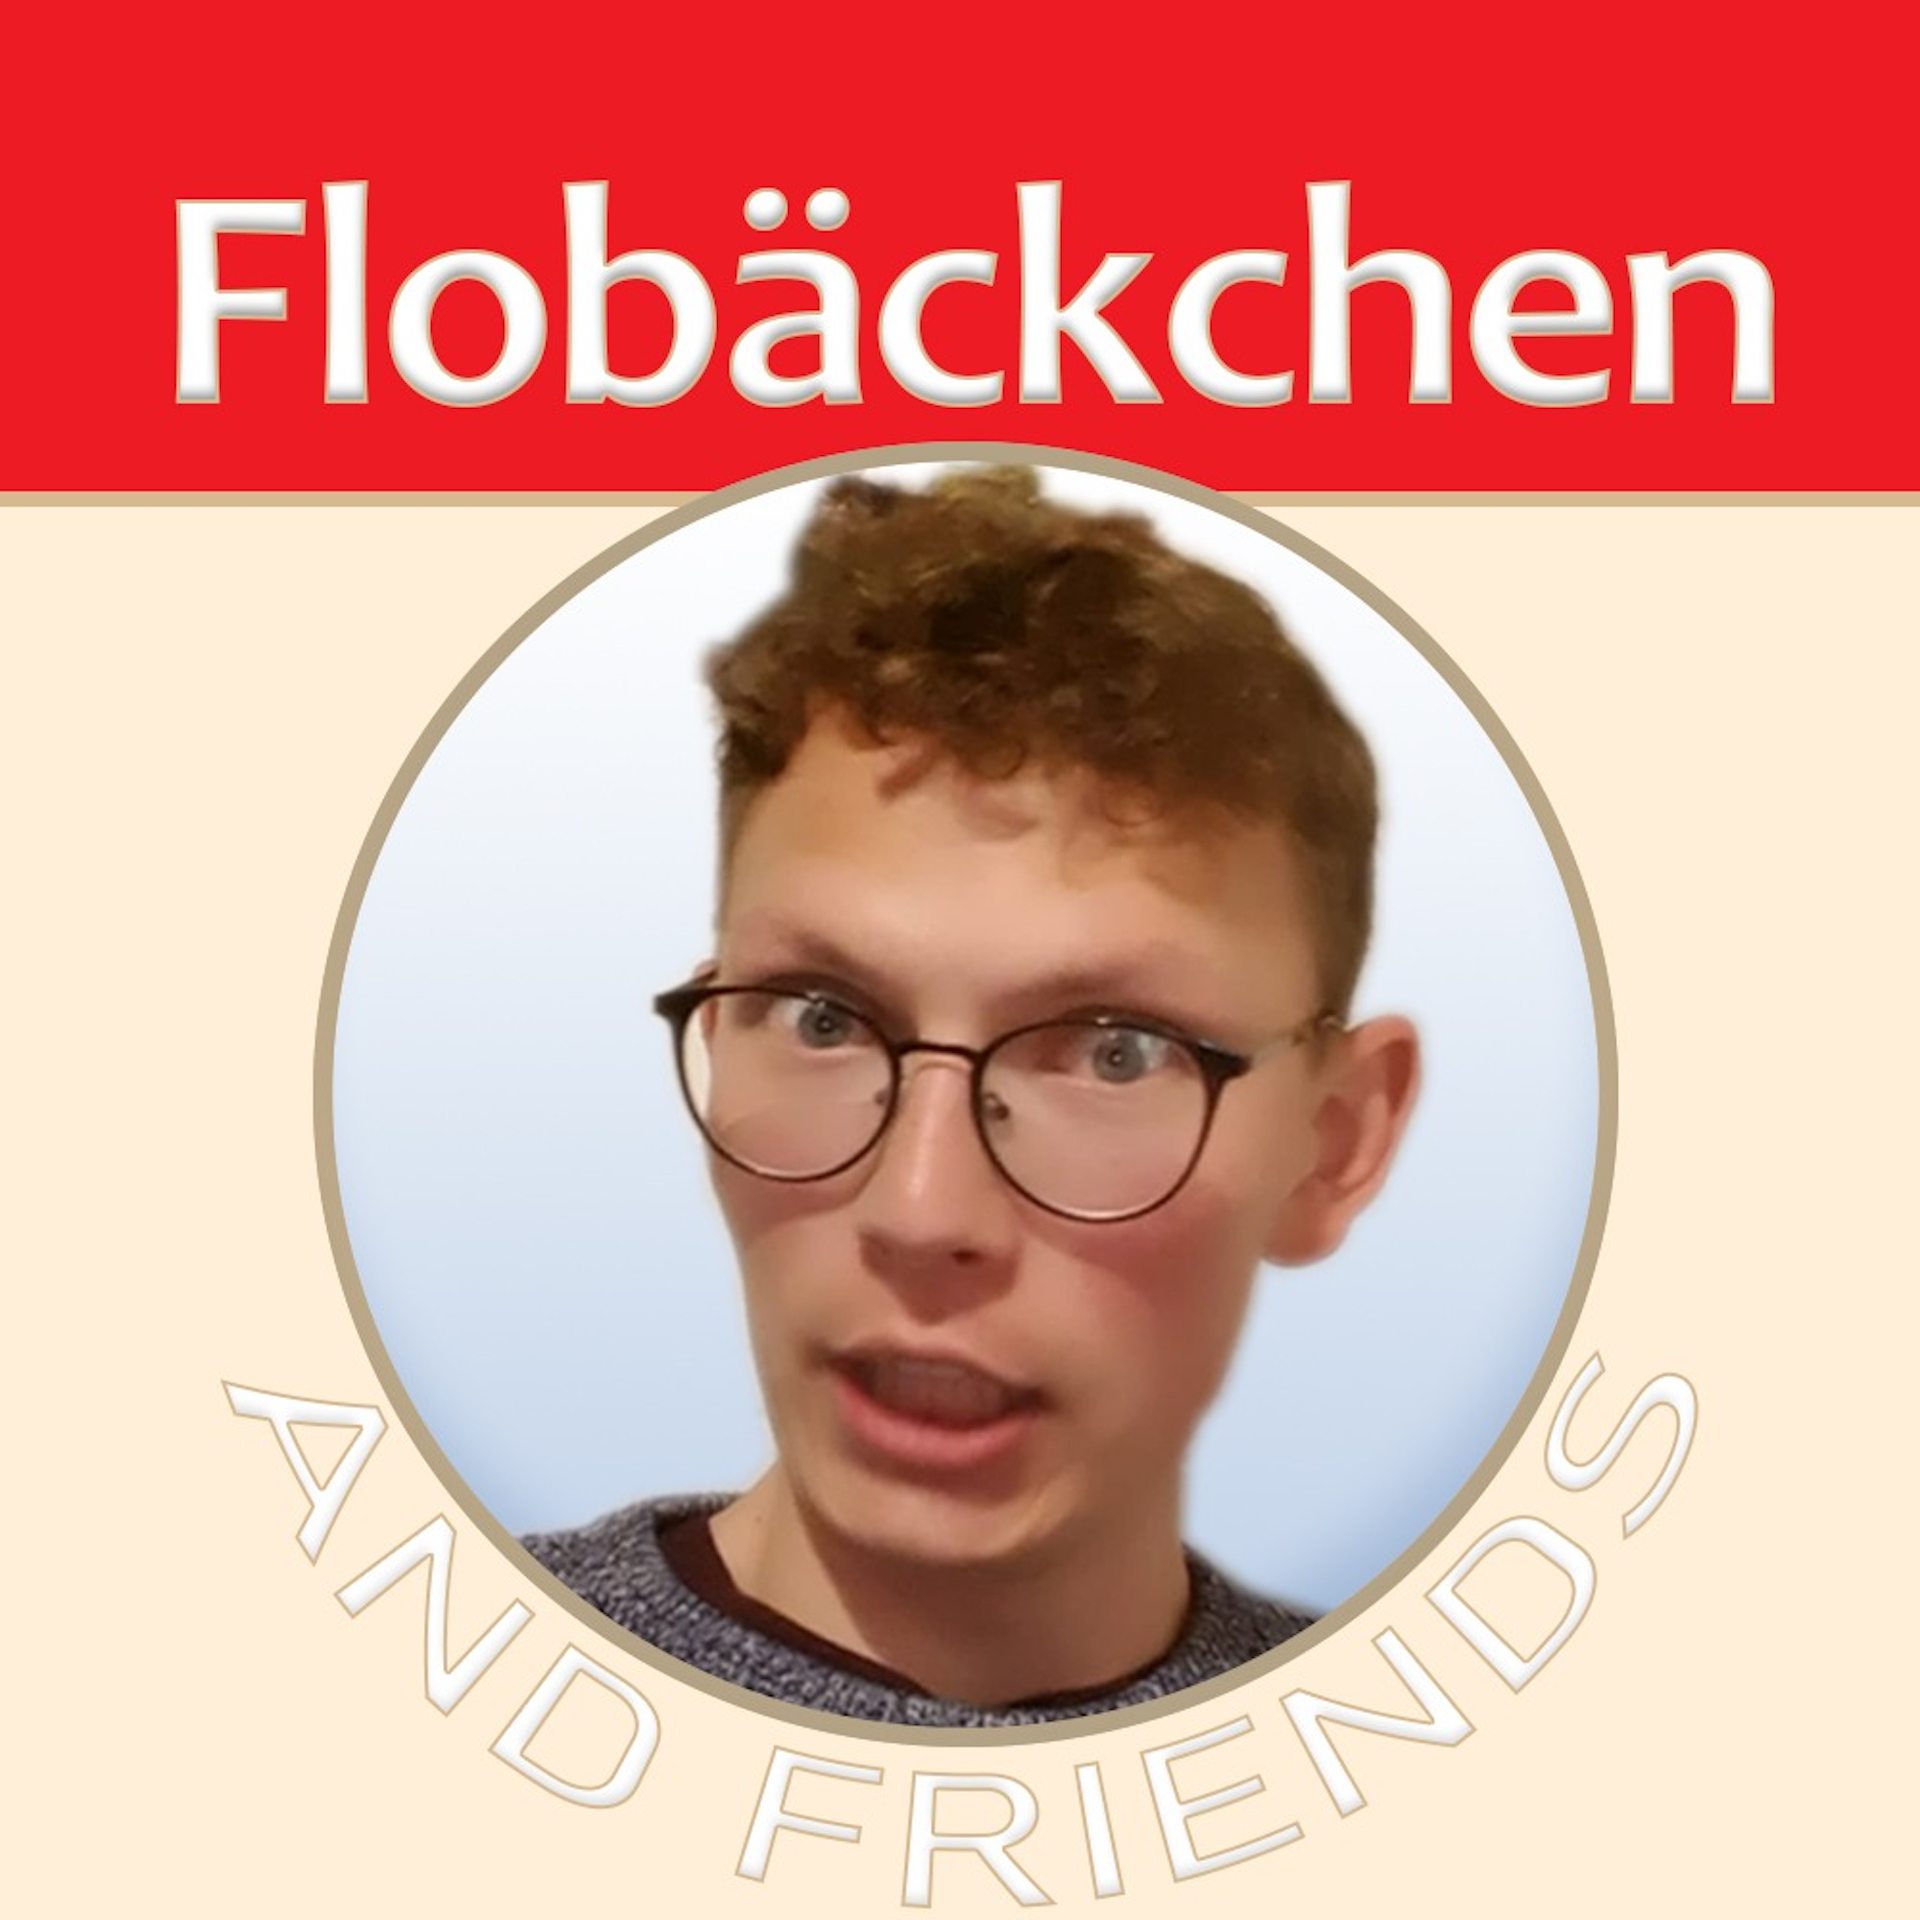 Flobäckchen and Friends